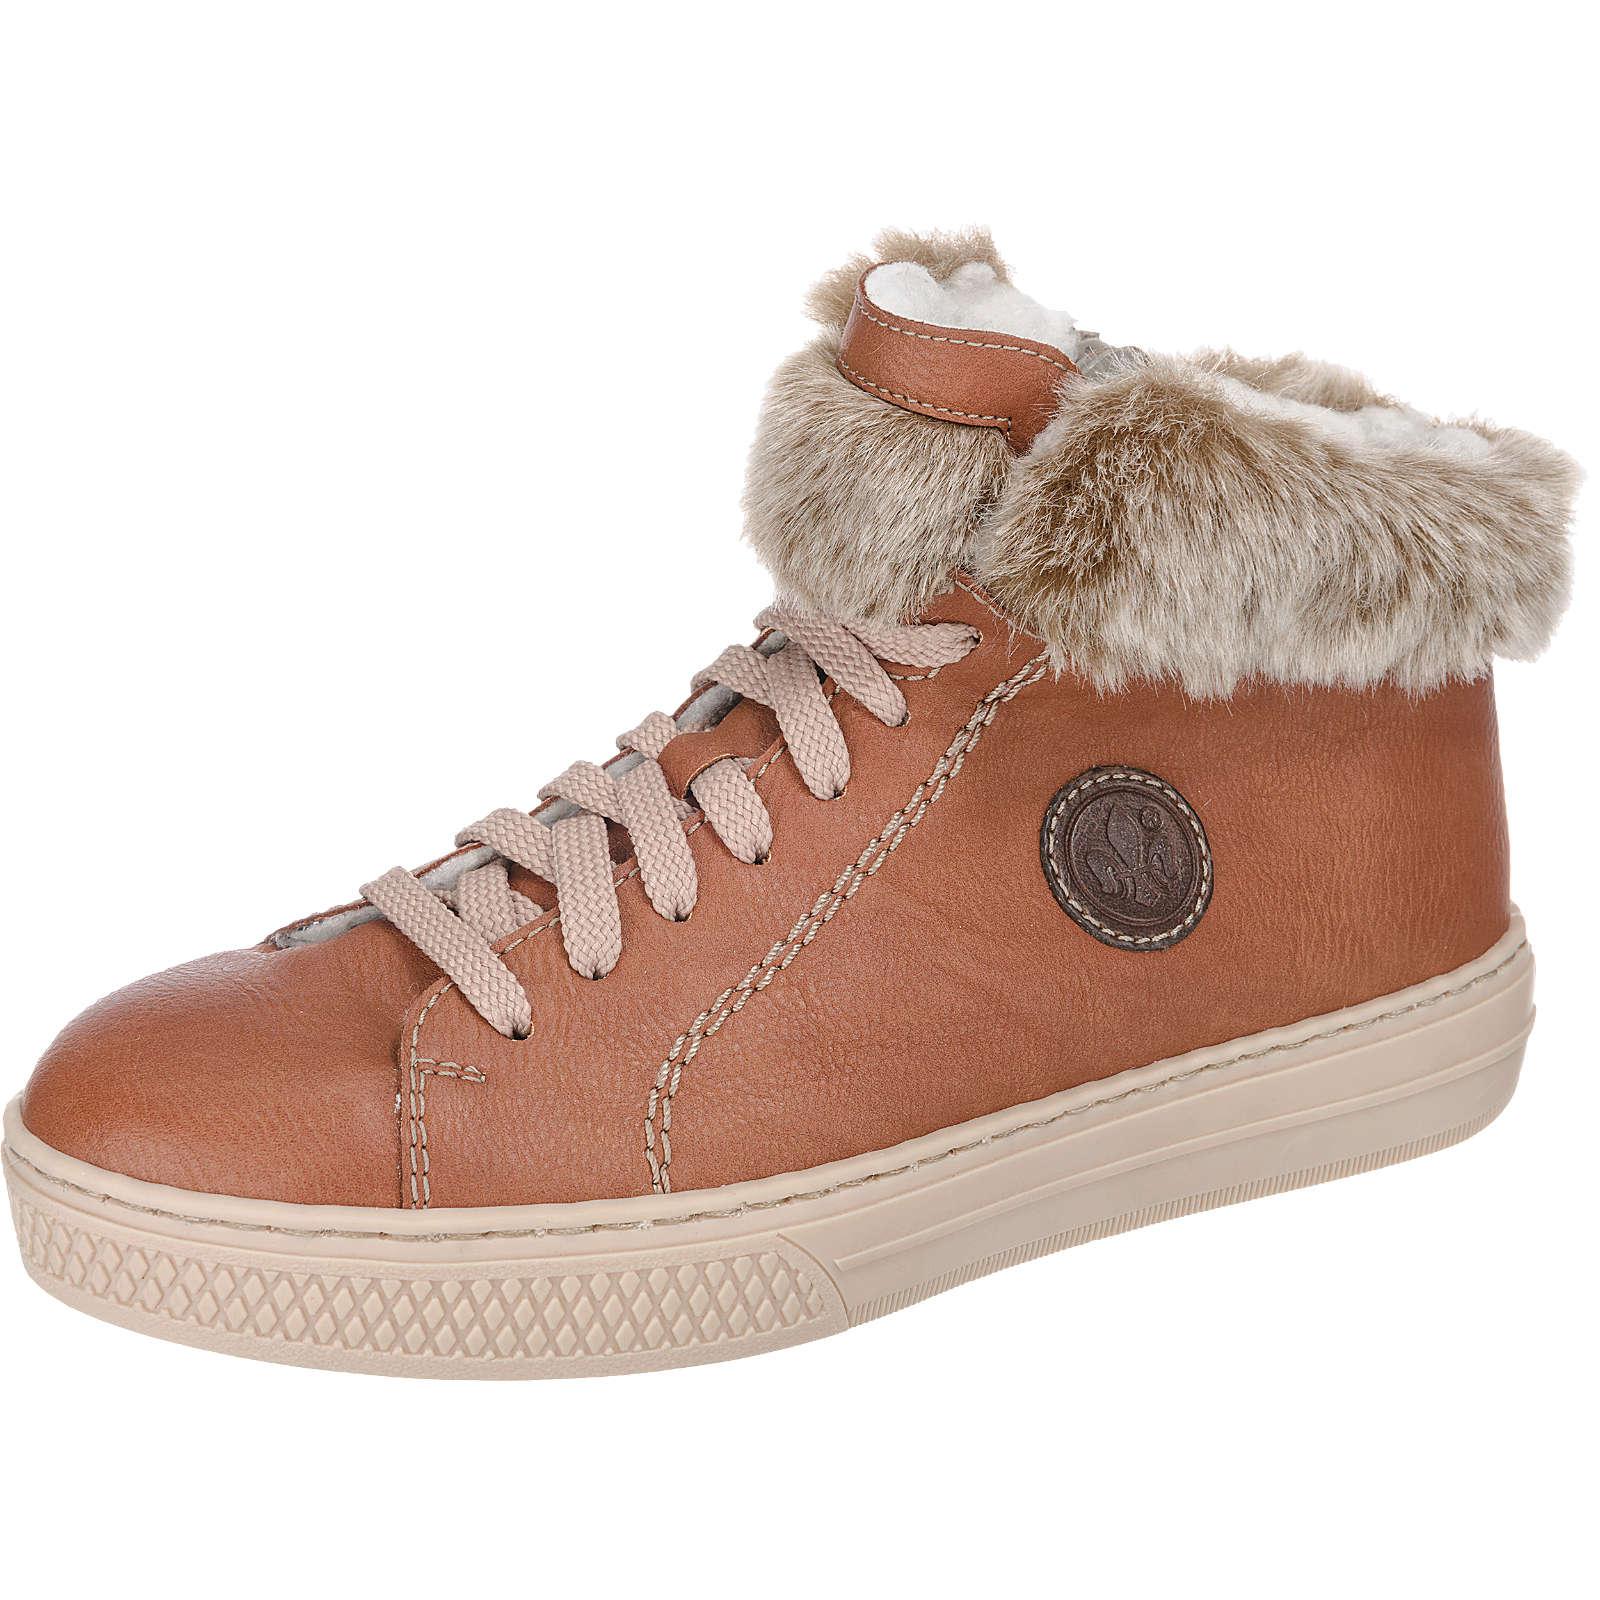 rieker Sneakers braun Damen Gr. 36